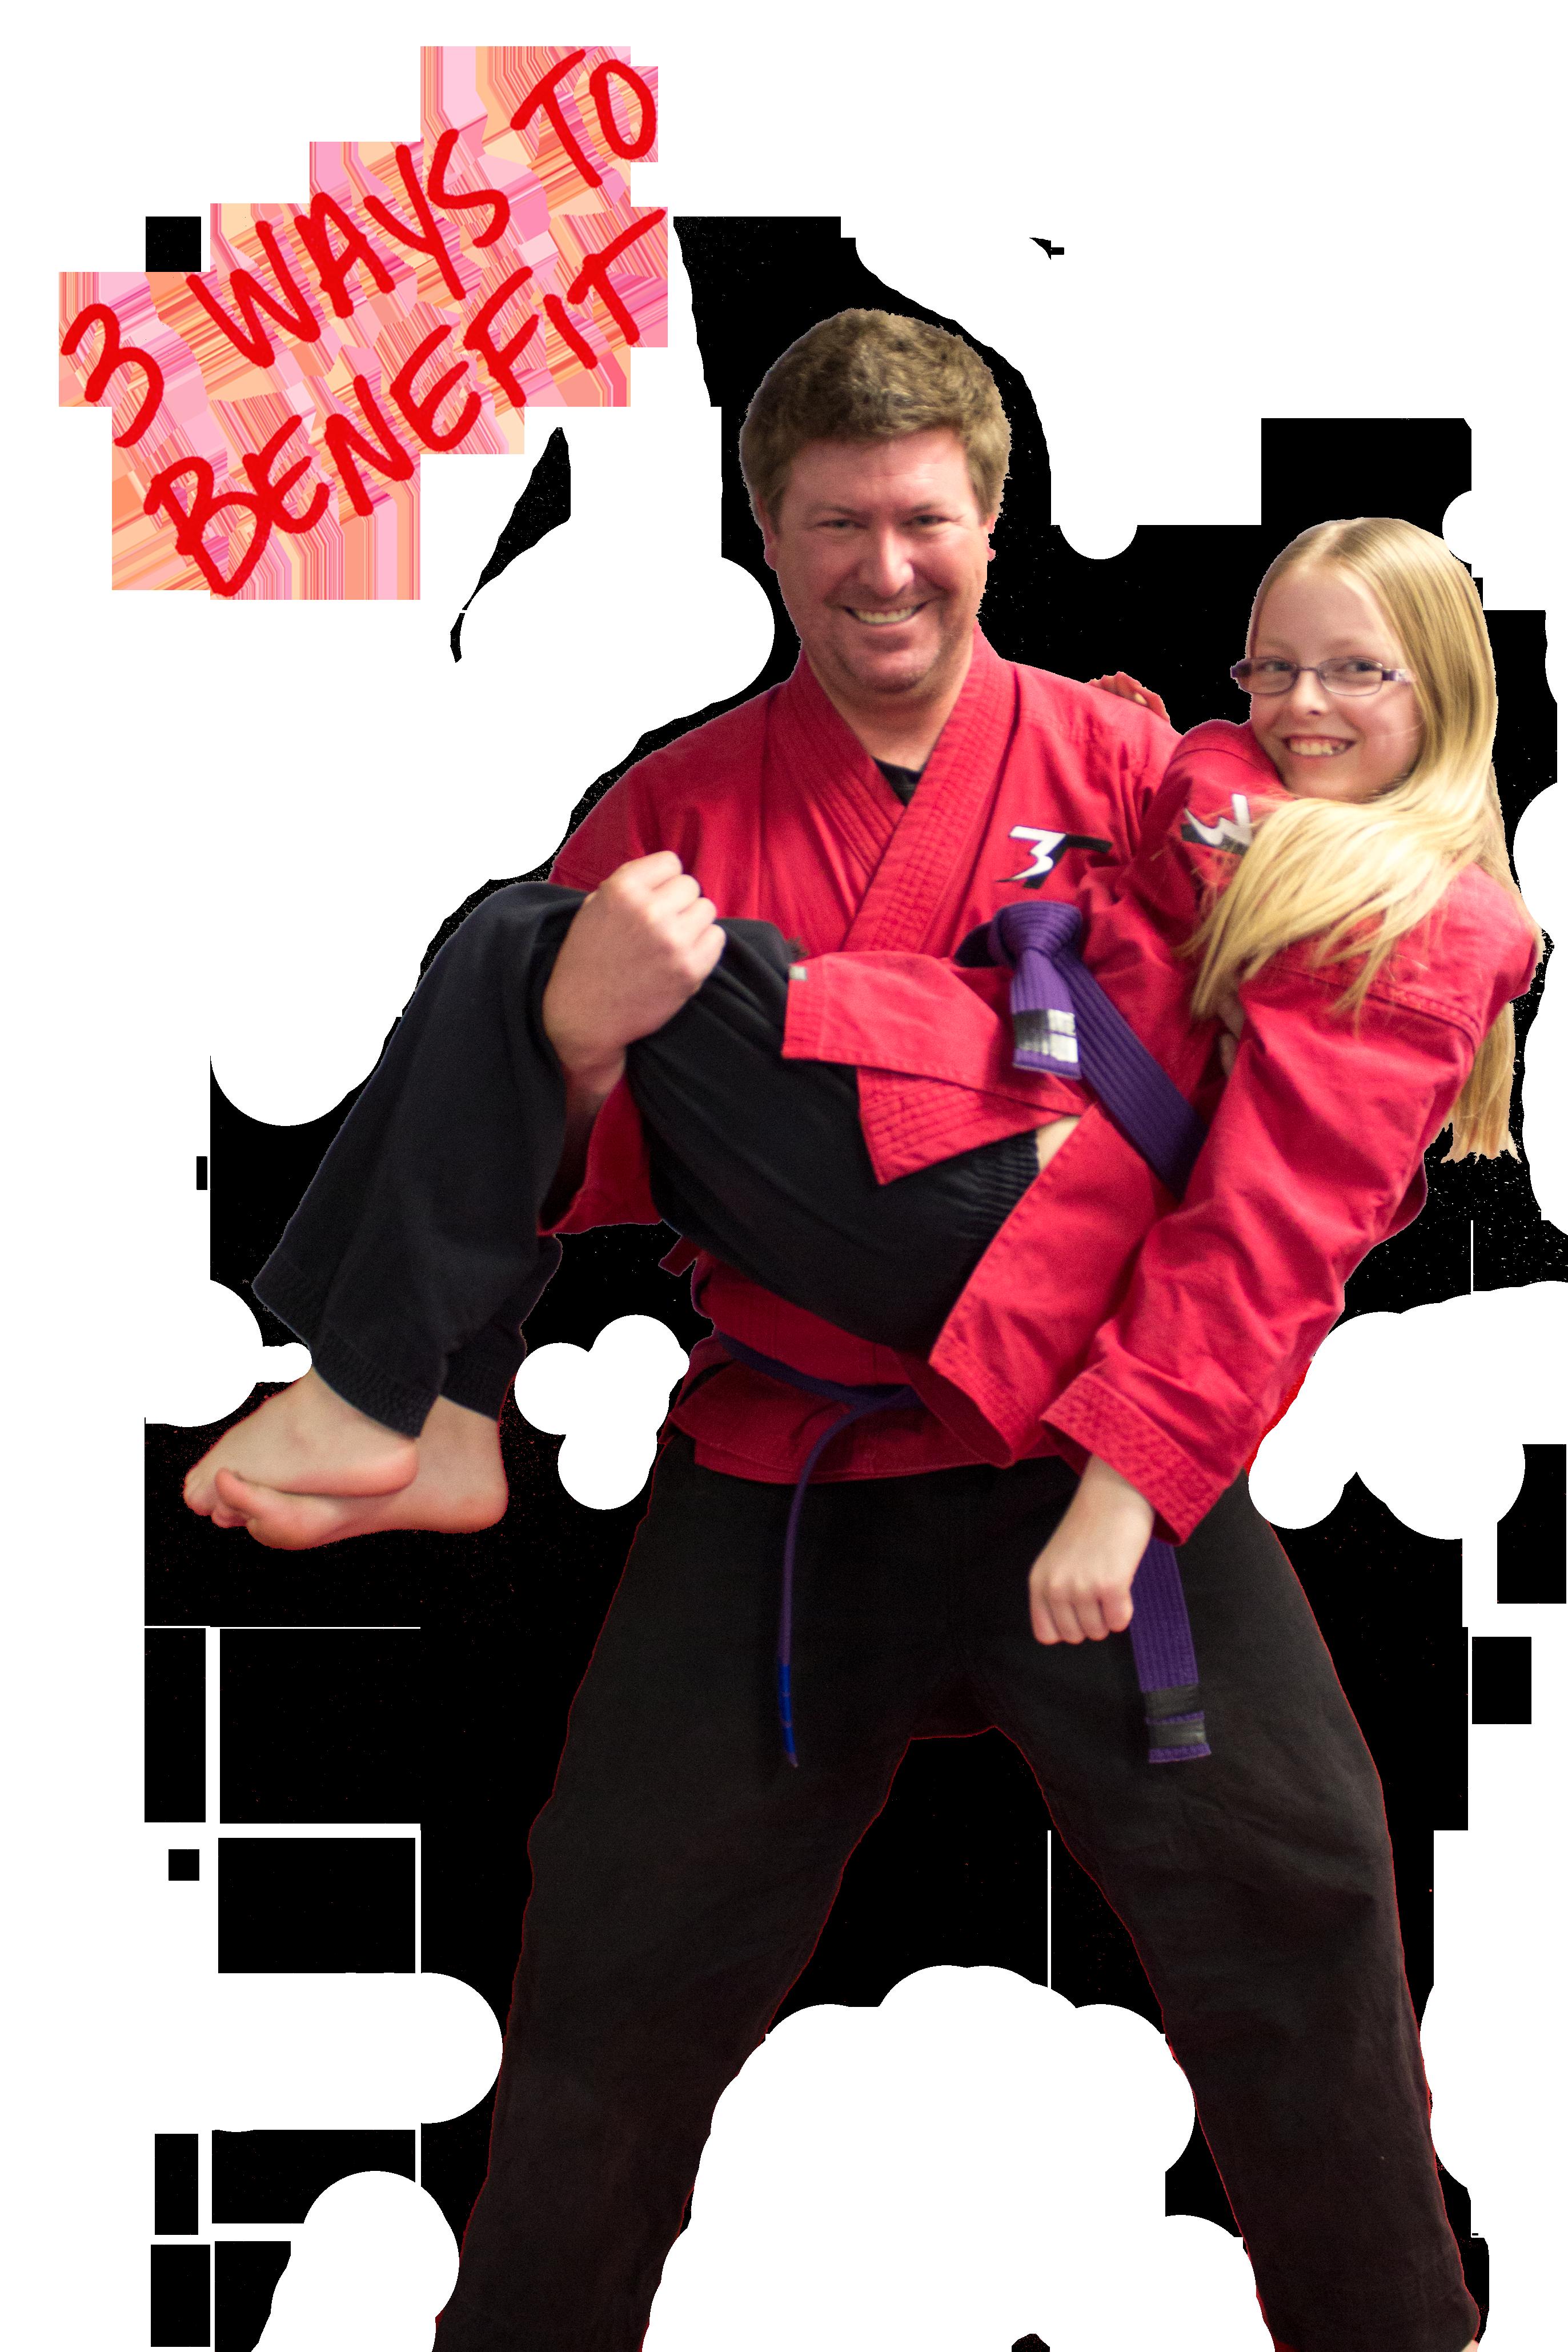 family karate 3 ways